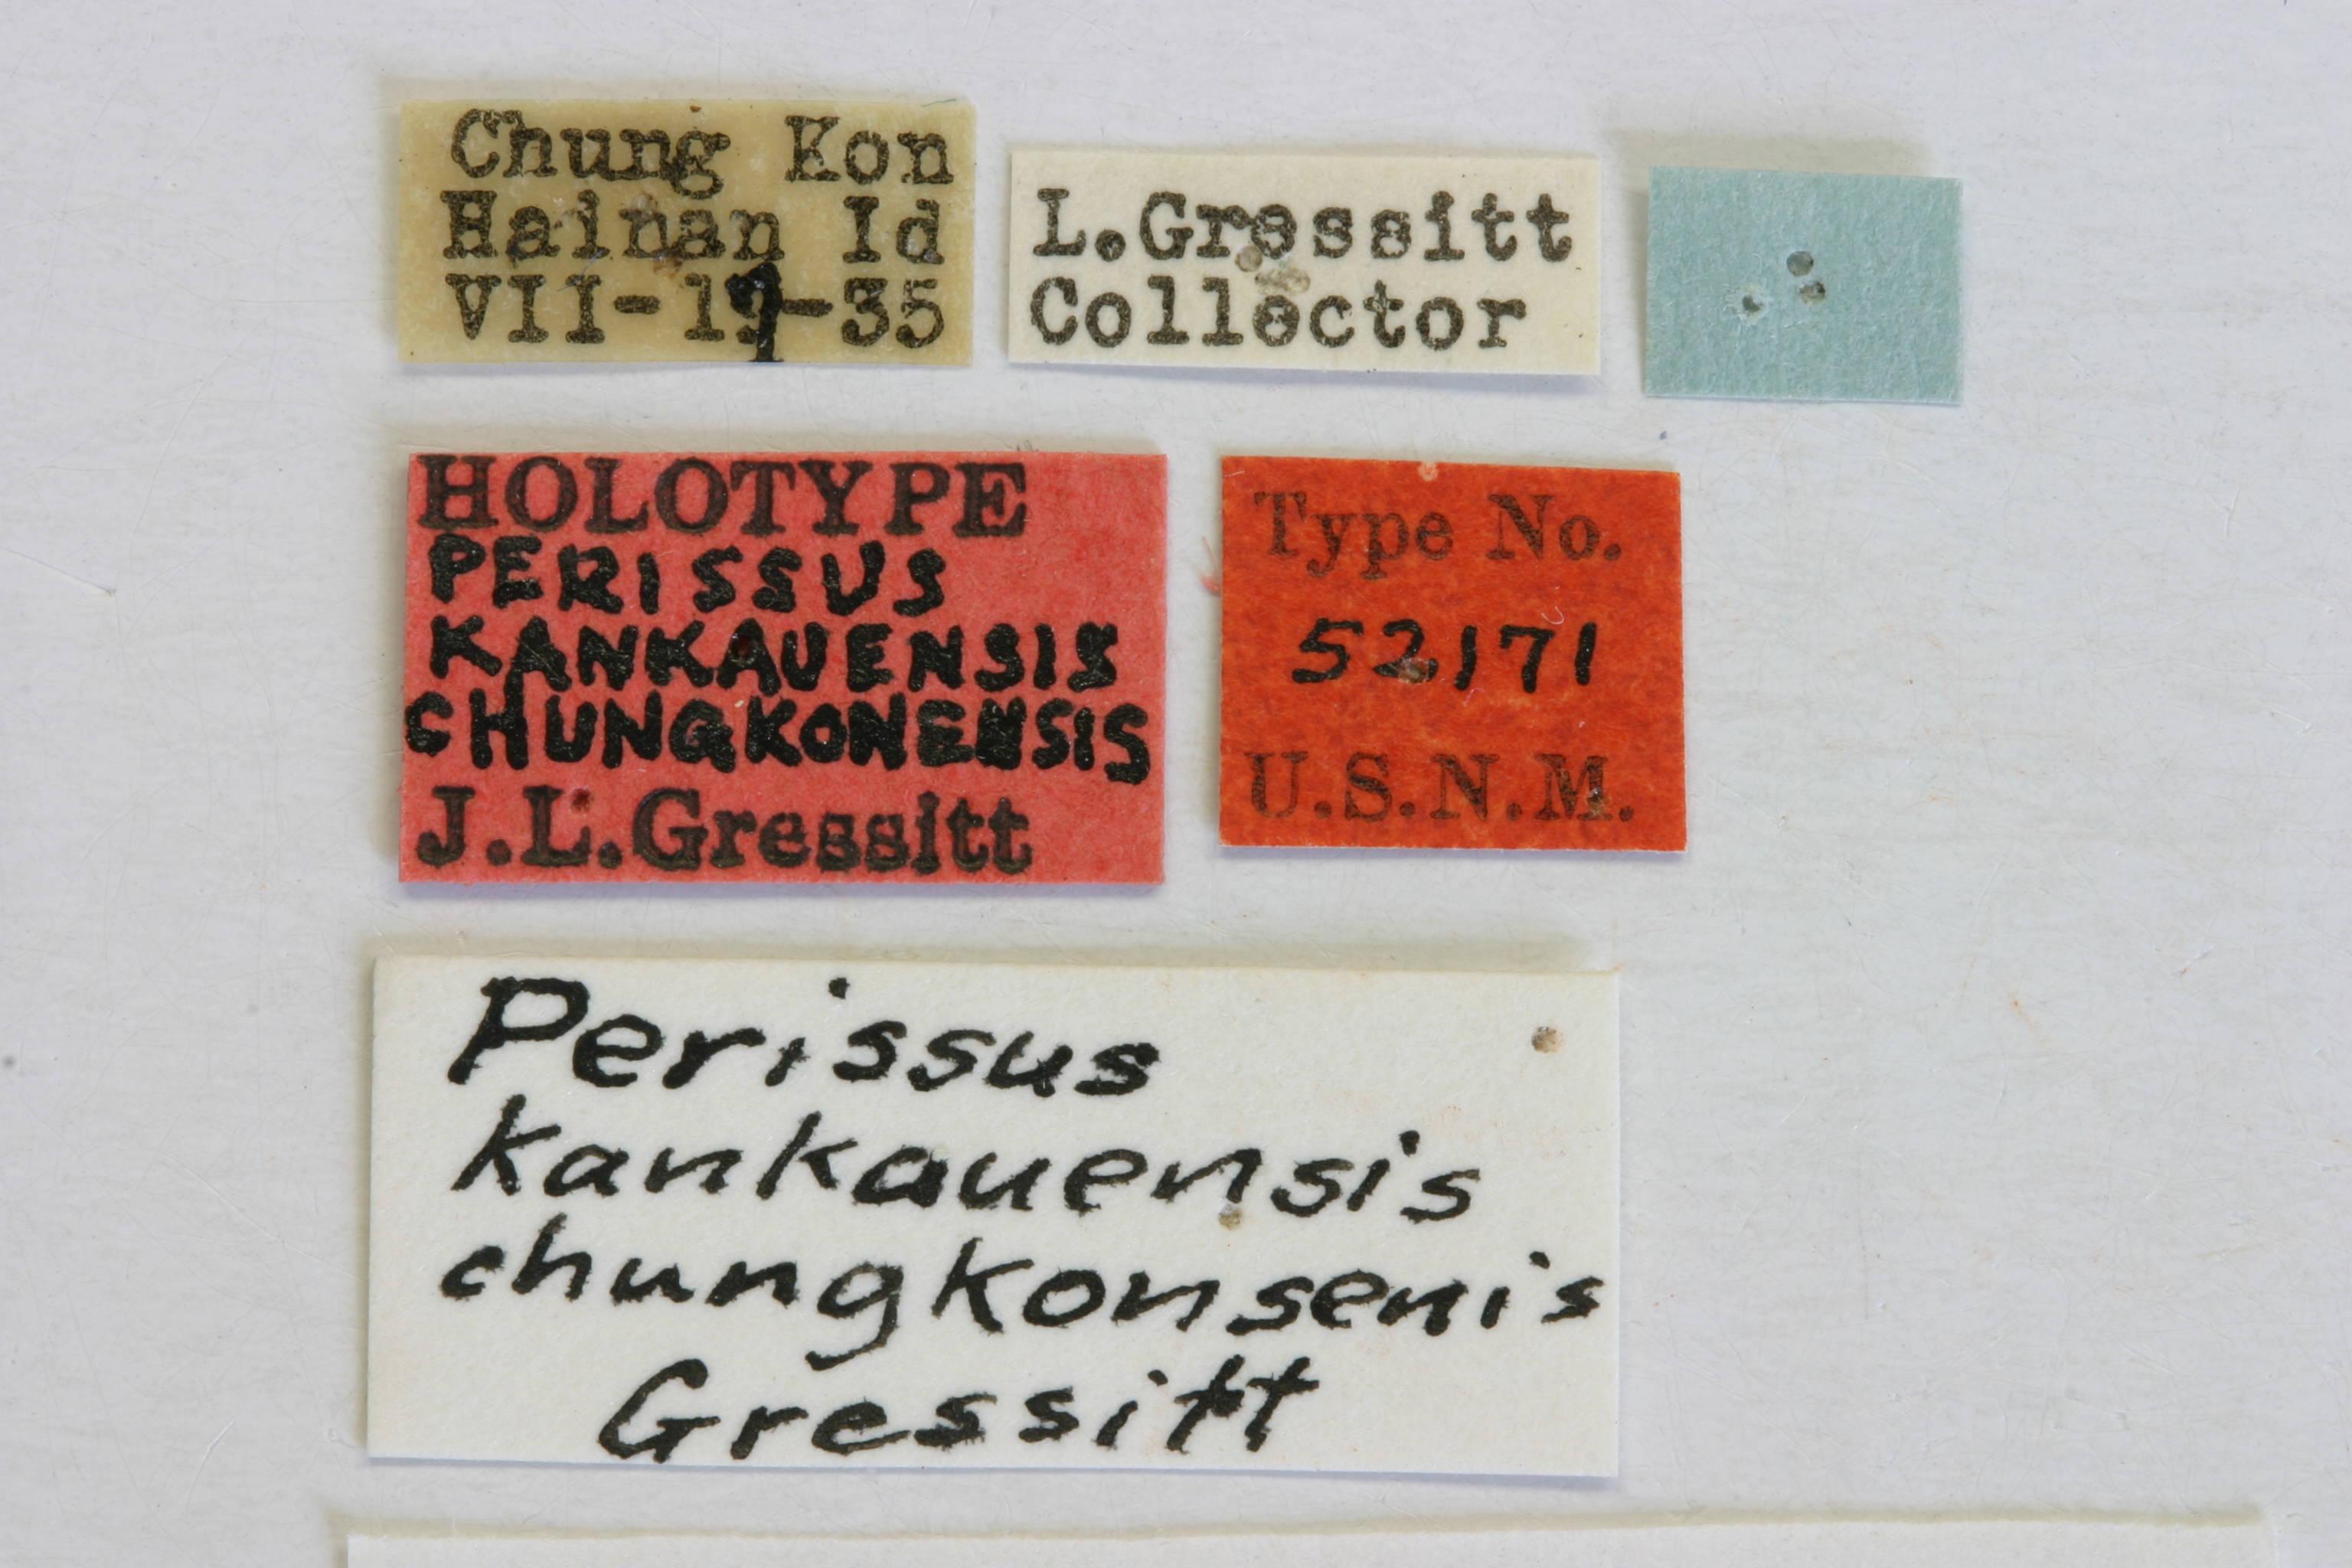 Image of <i>Perissus kankauensis</i> ssp. <i>chungkonsenis</i> Gressitt